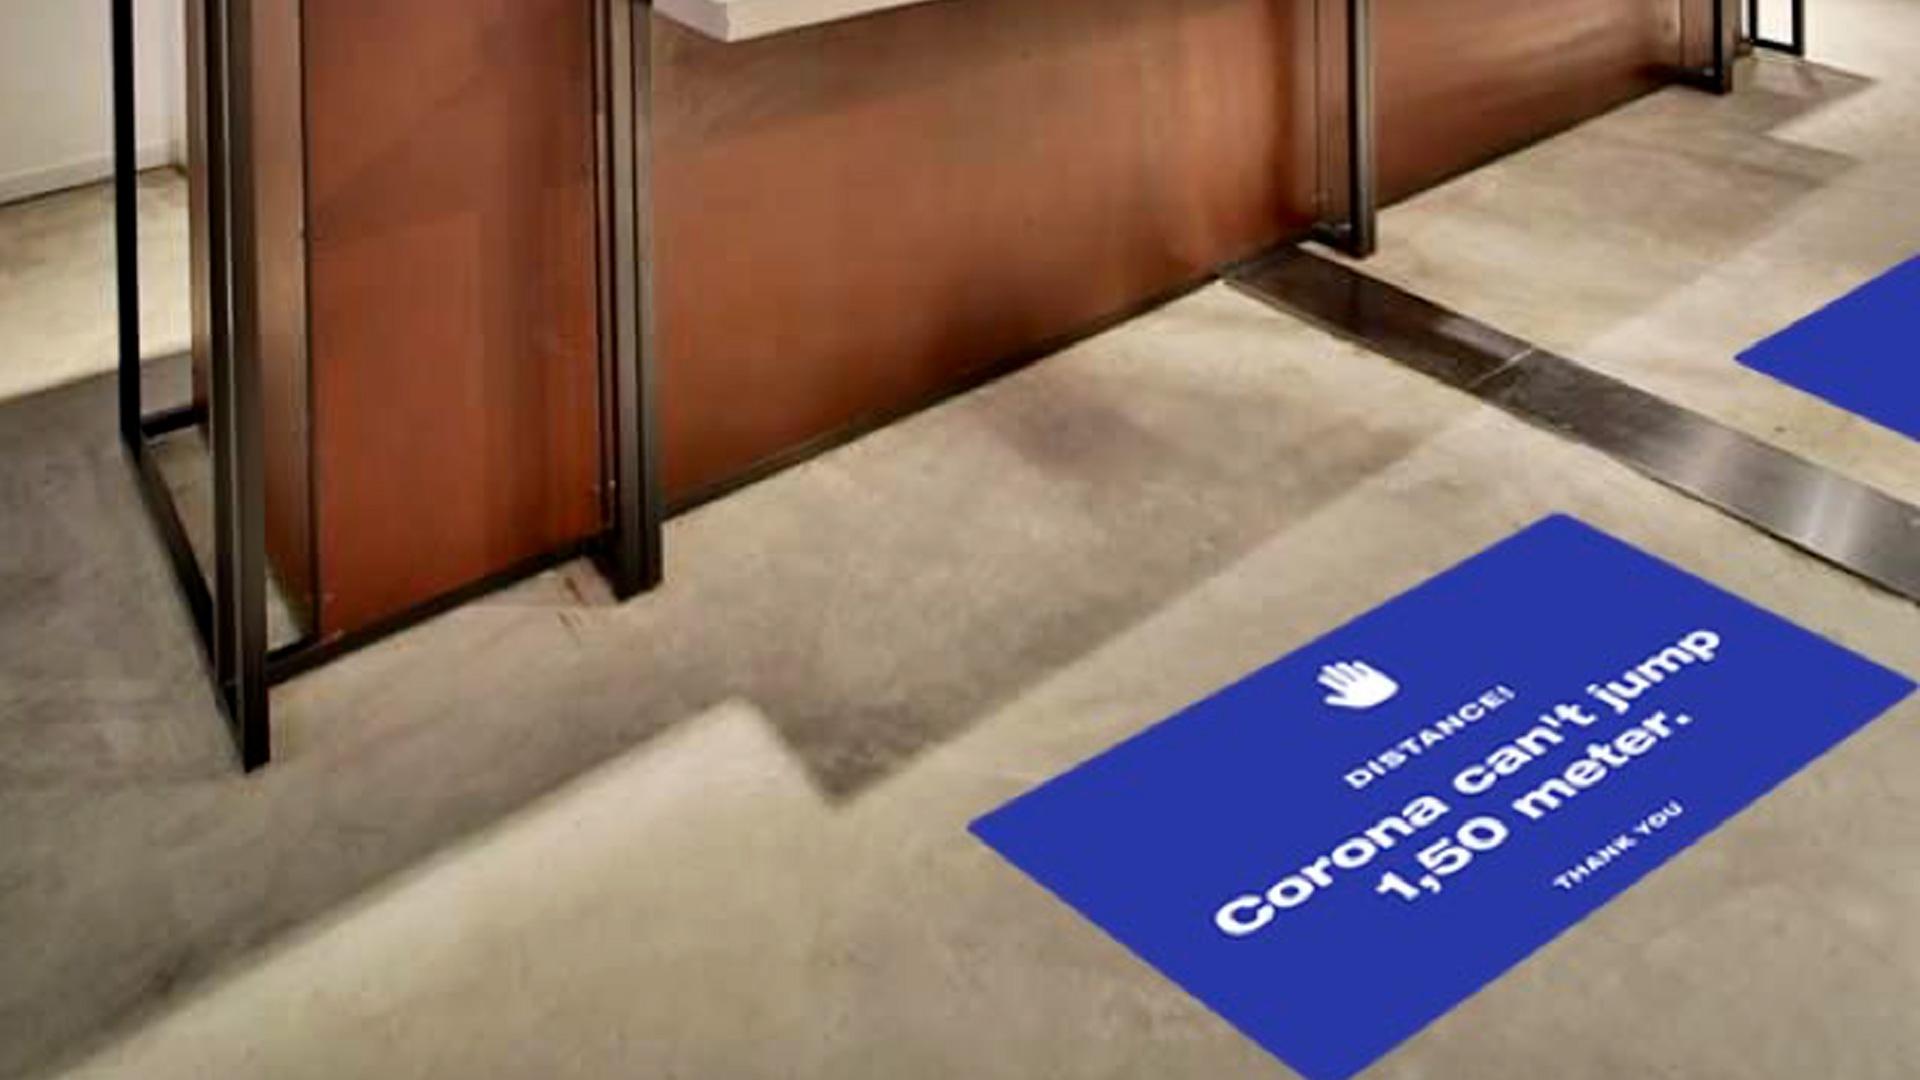 Corona Protection Tools, Schutzmaßnahmen, Retail Lösungen, Social Distancing, Floor Stickers, Raumtrenner, Bodenbeklebungen, Desinfektionsschutz Infektionsschutz